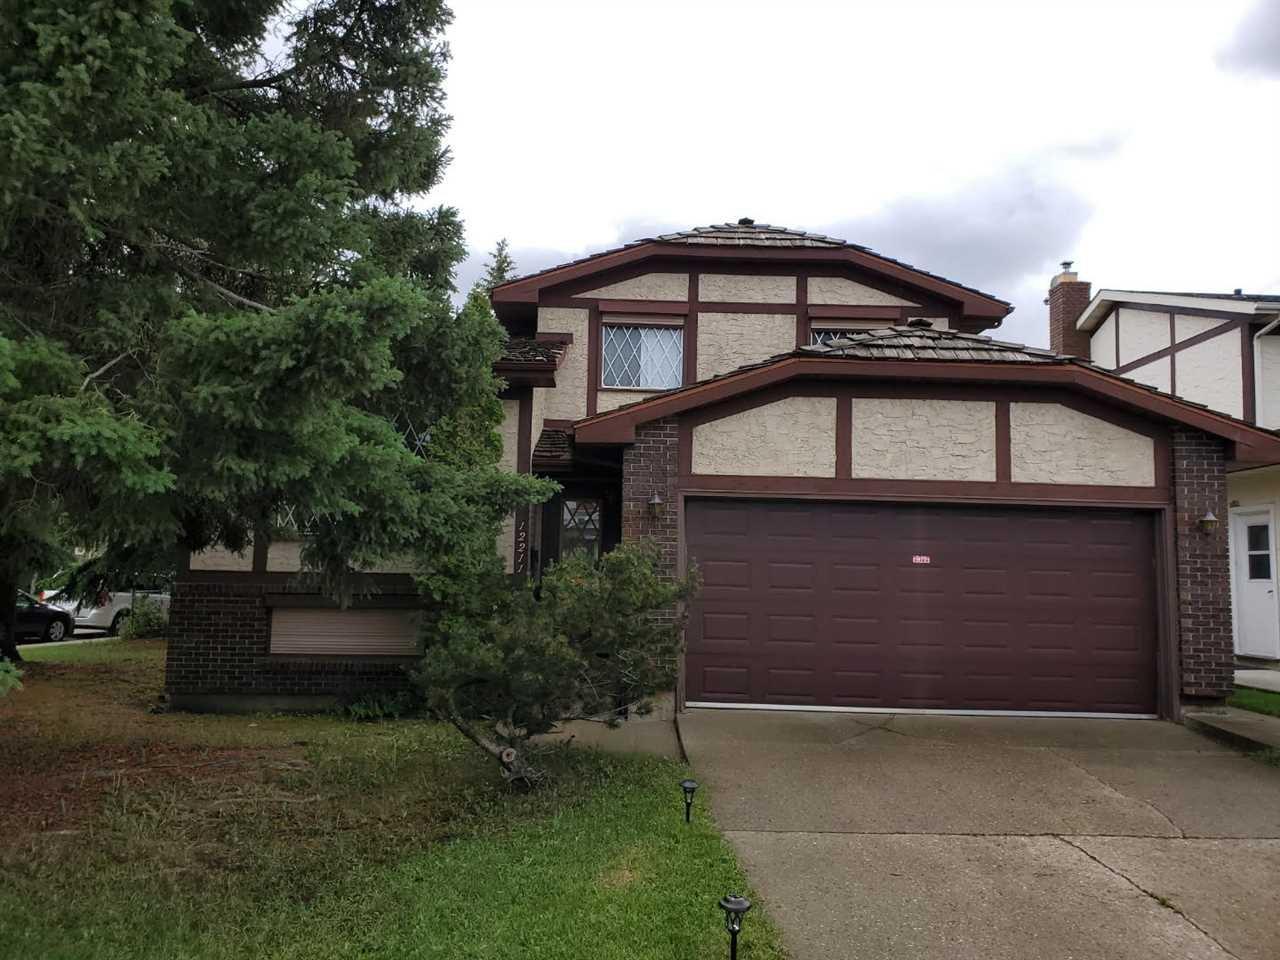 Main Photo: 12211 143 Avenue in Edmonton: Zone 27 House for sale : MLS®# E4193426